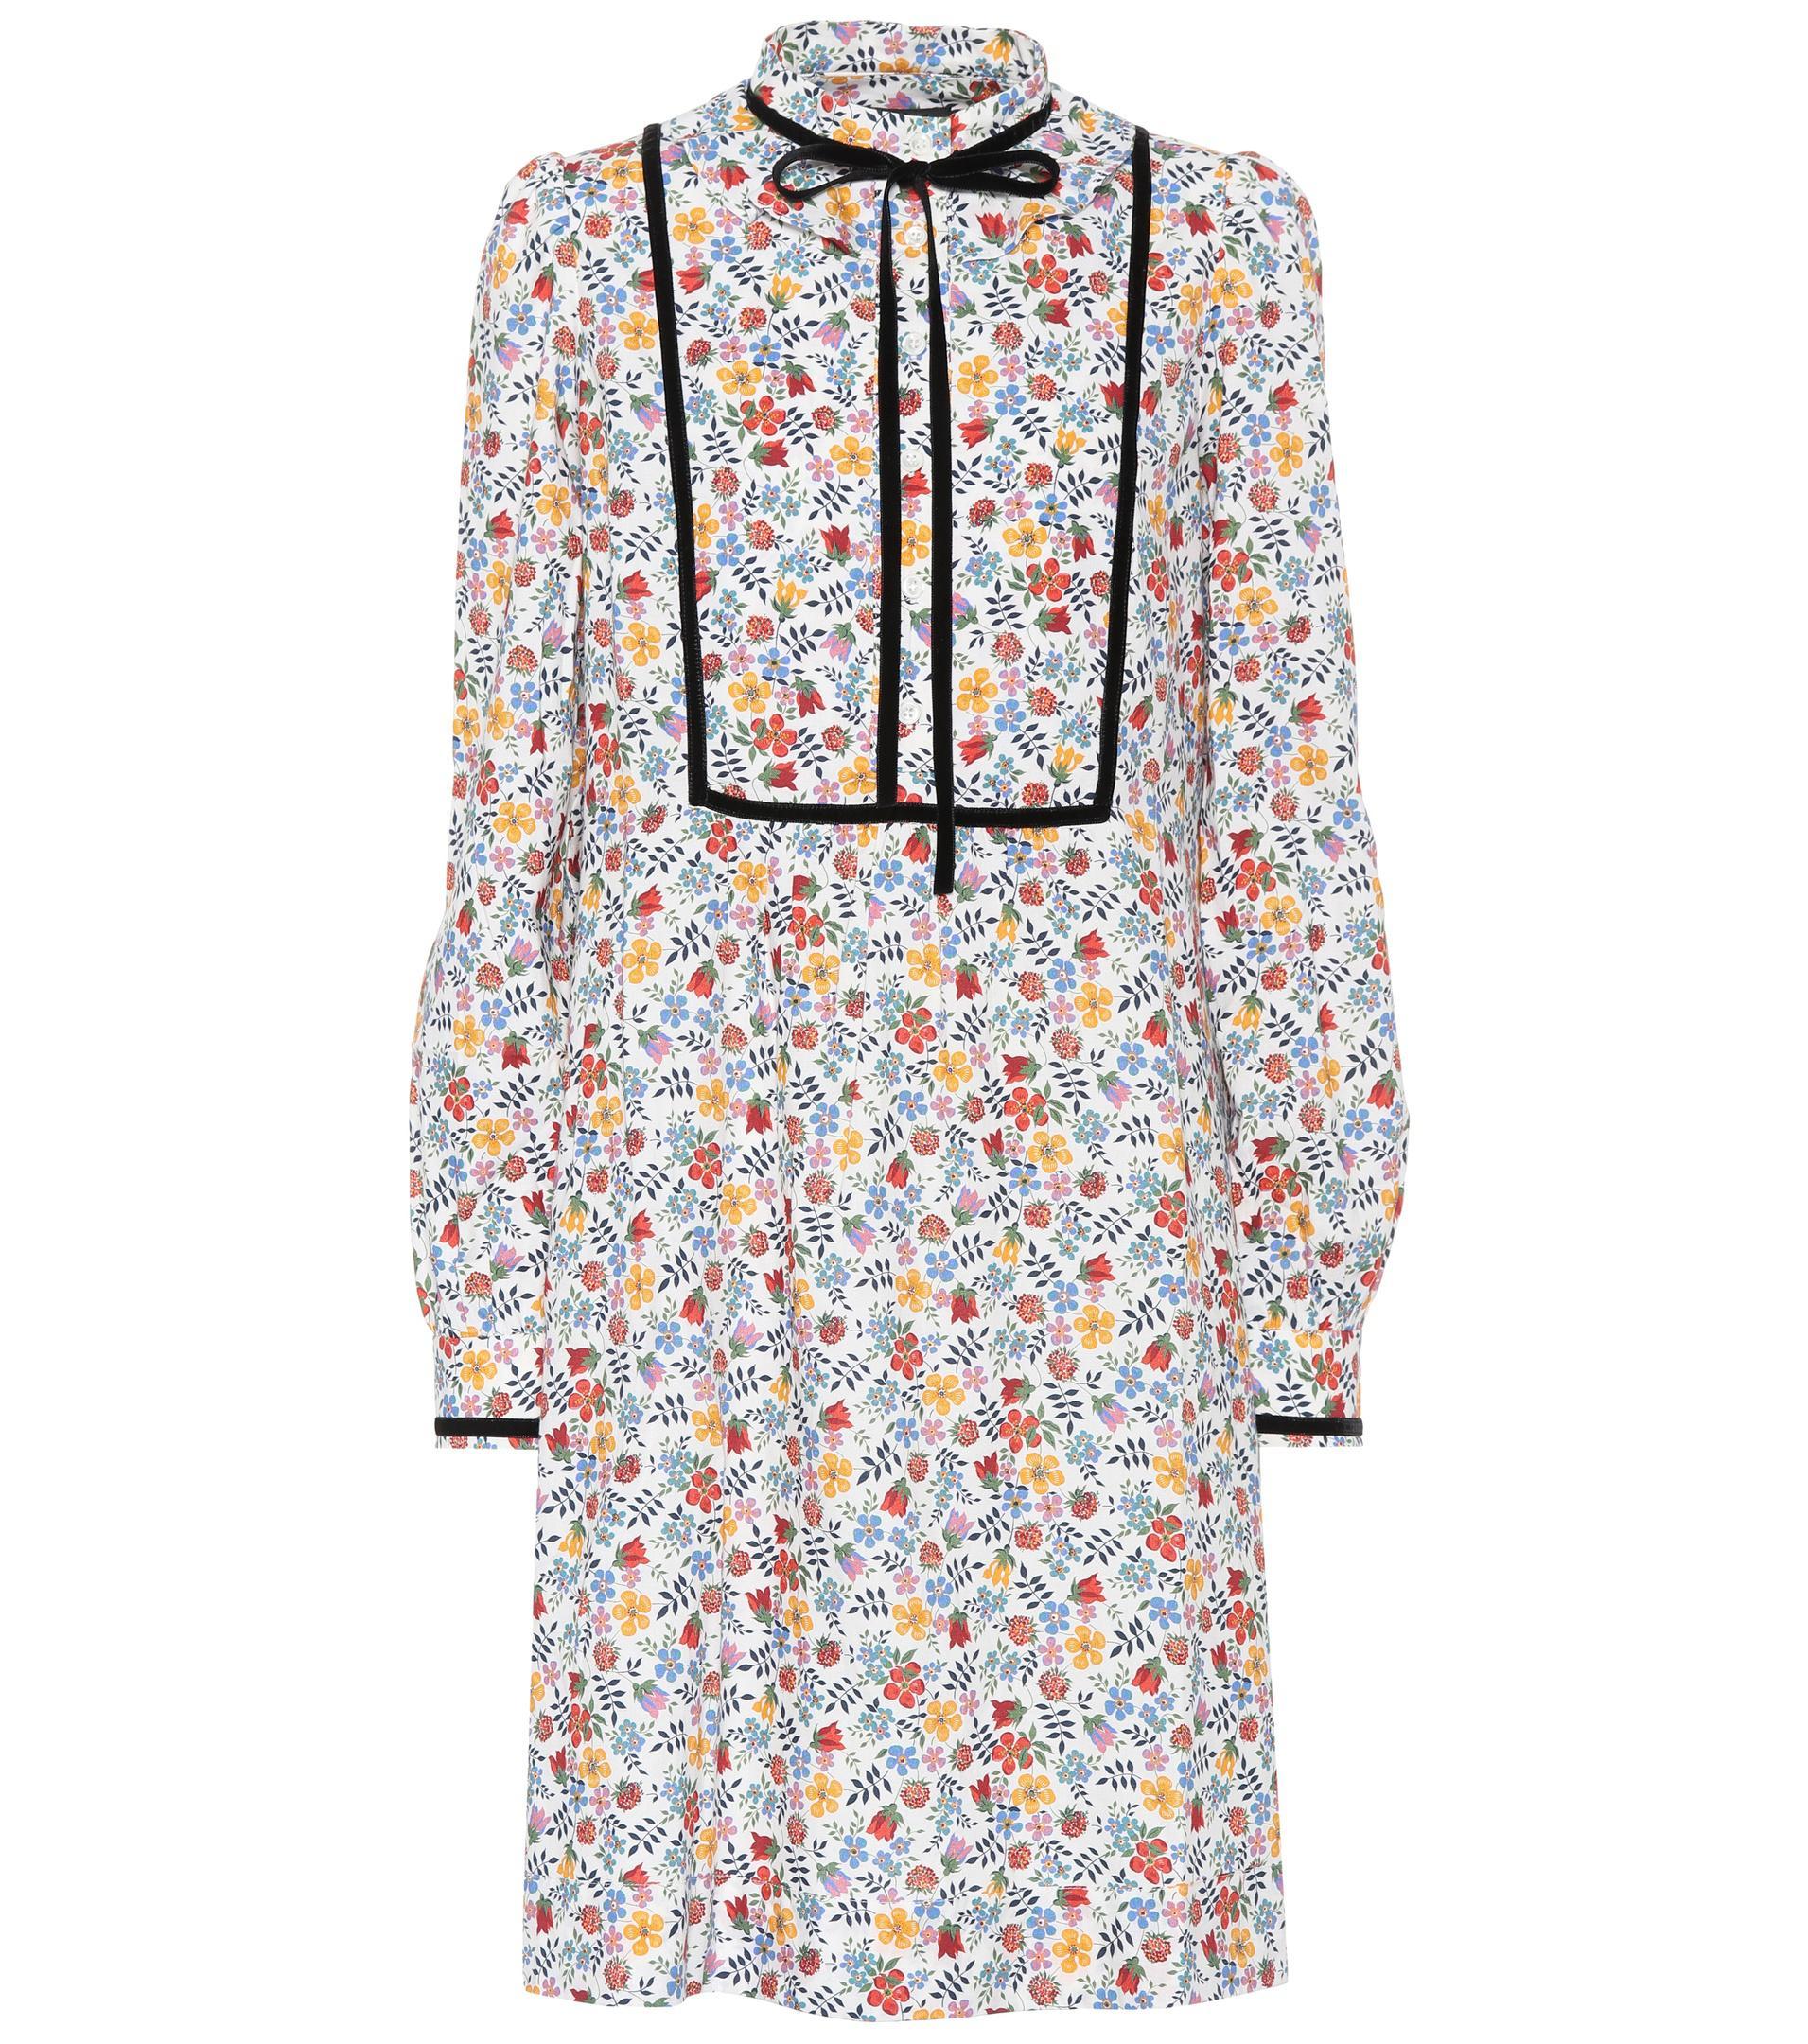 Rita printed cotton dress A.P.C. hewVreAtzJ